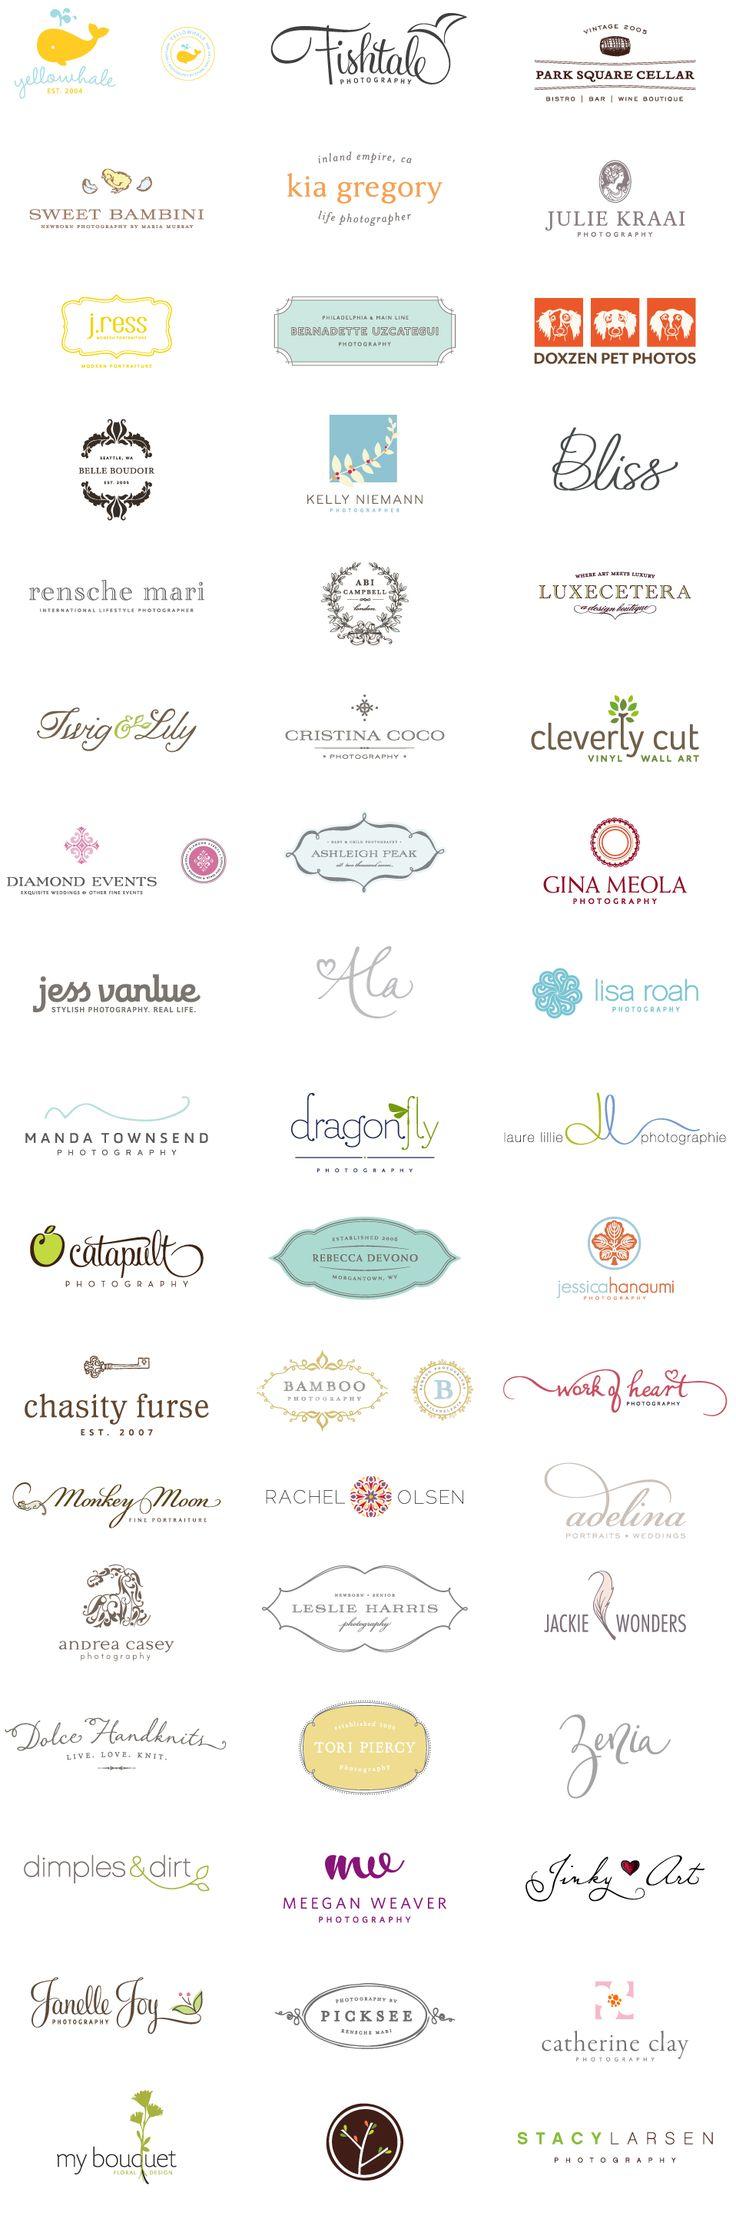 great logo design - I like the type used on rensche mari / cristina coco / adelina / leslie harris / zenia